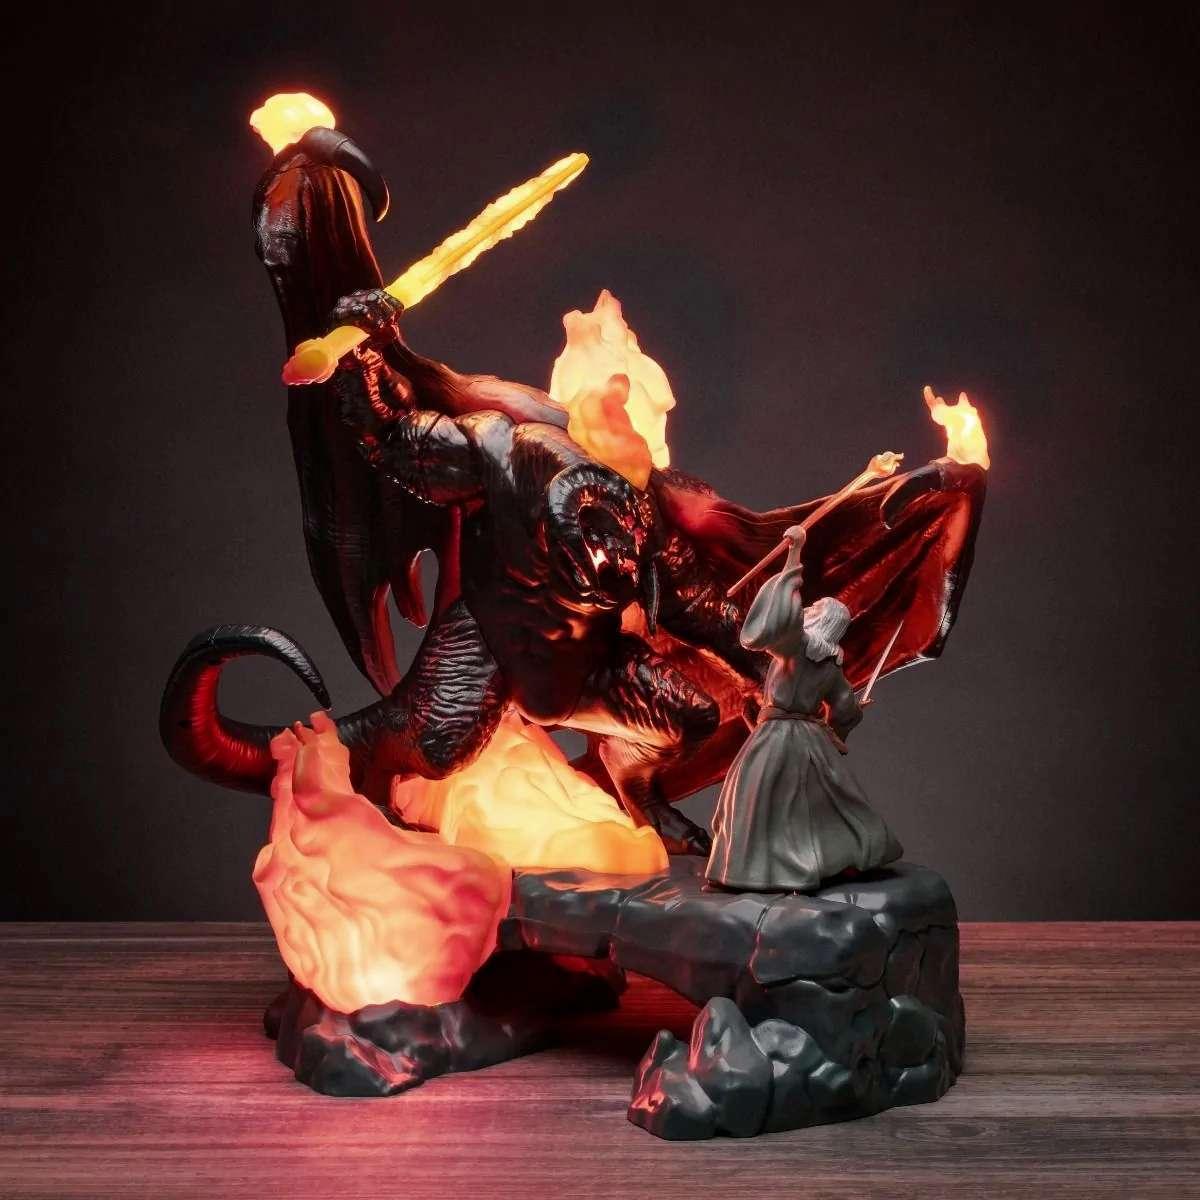 lotr-gandalf-vs-balrog-diorama-light